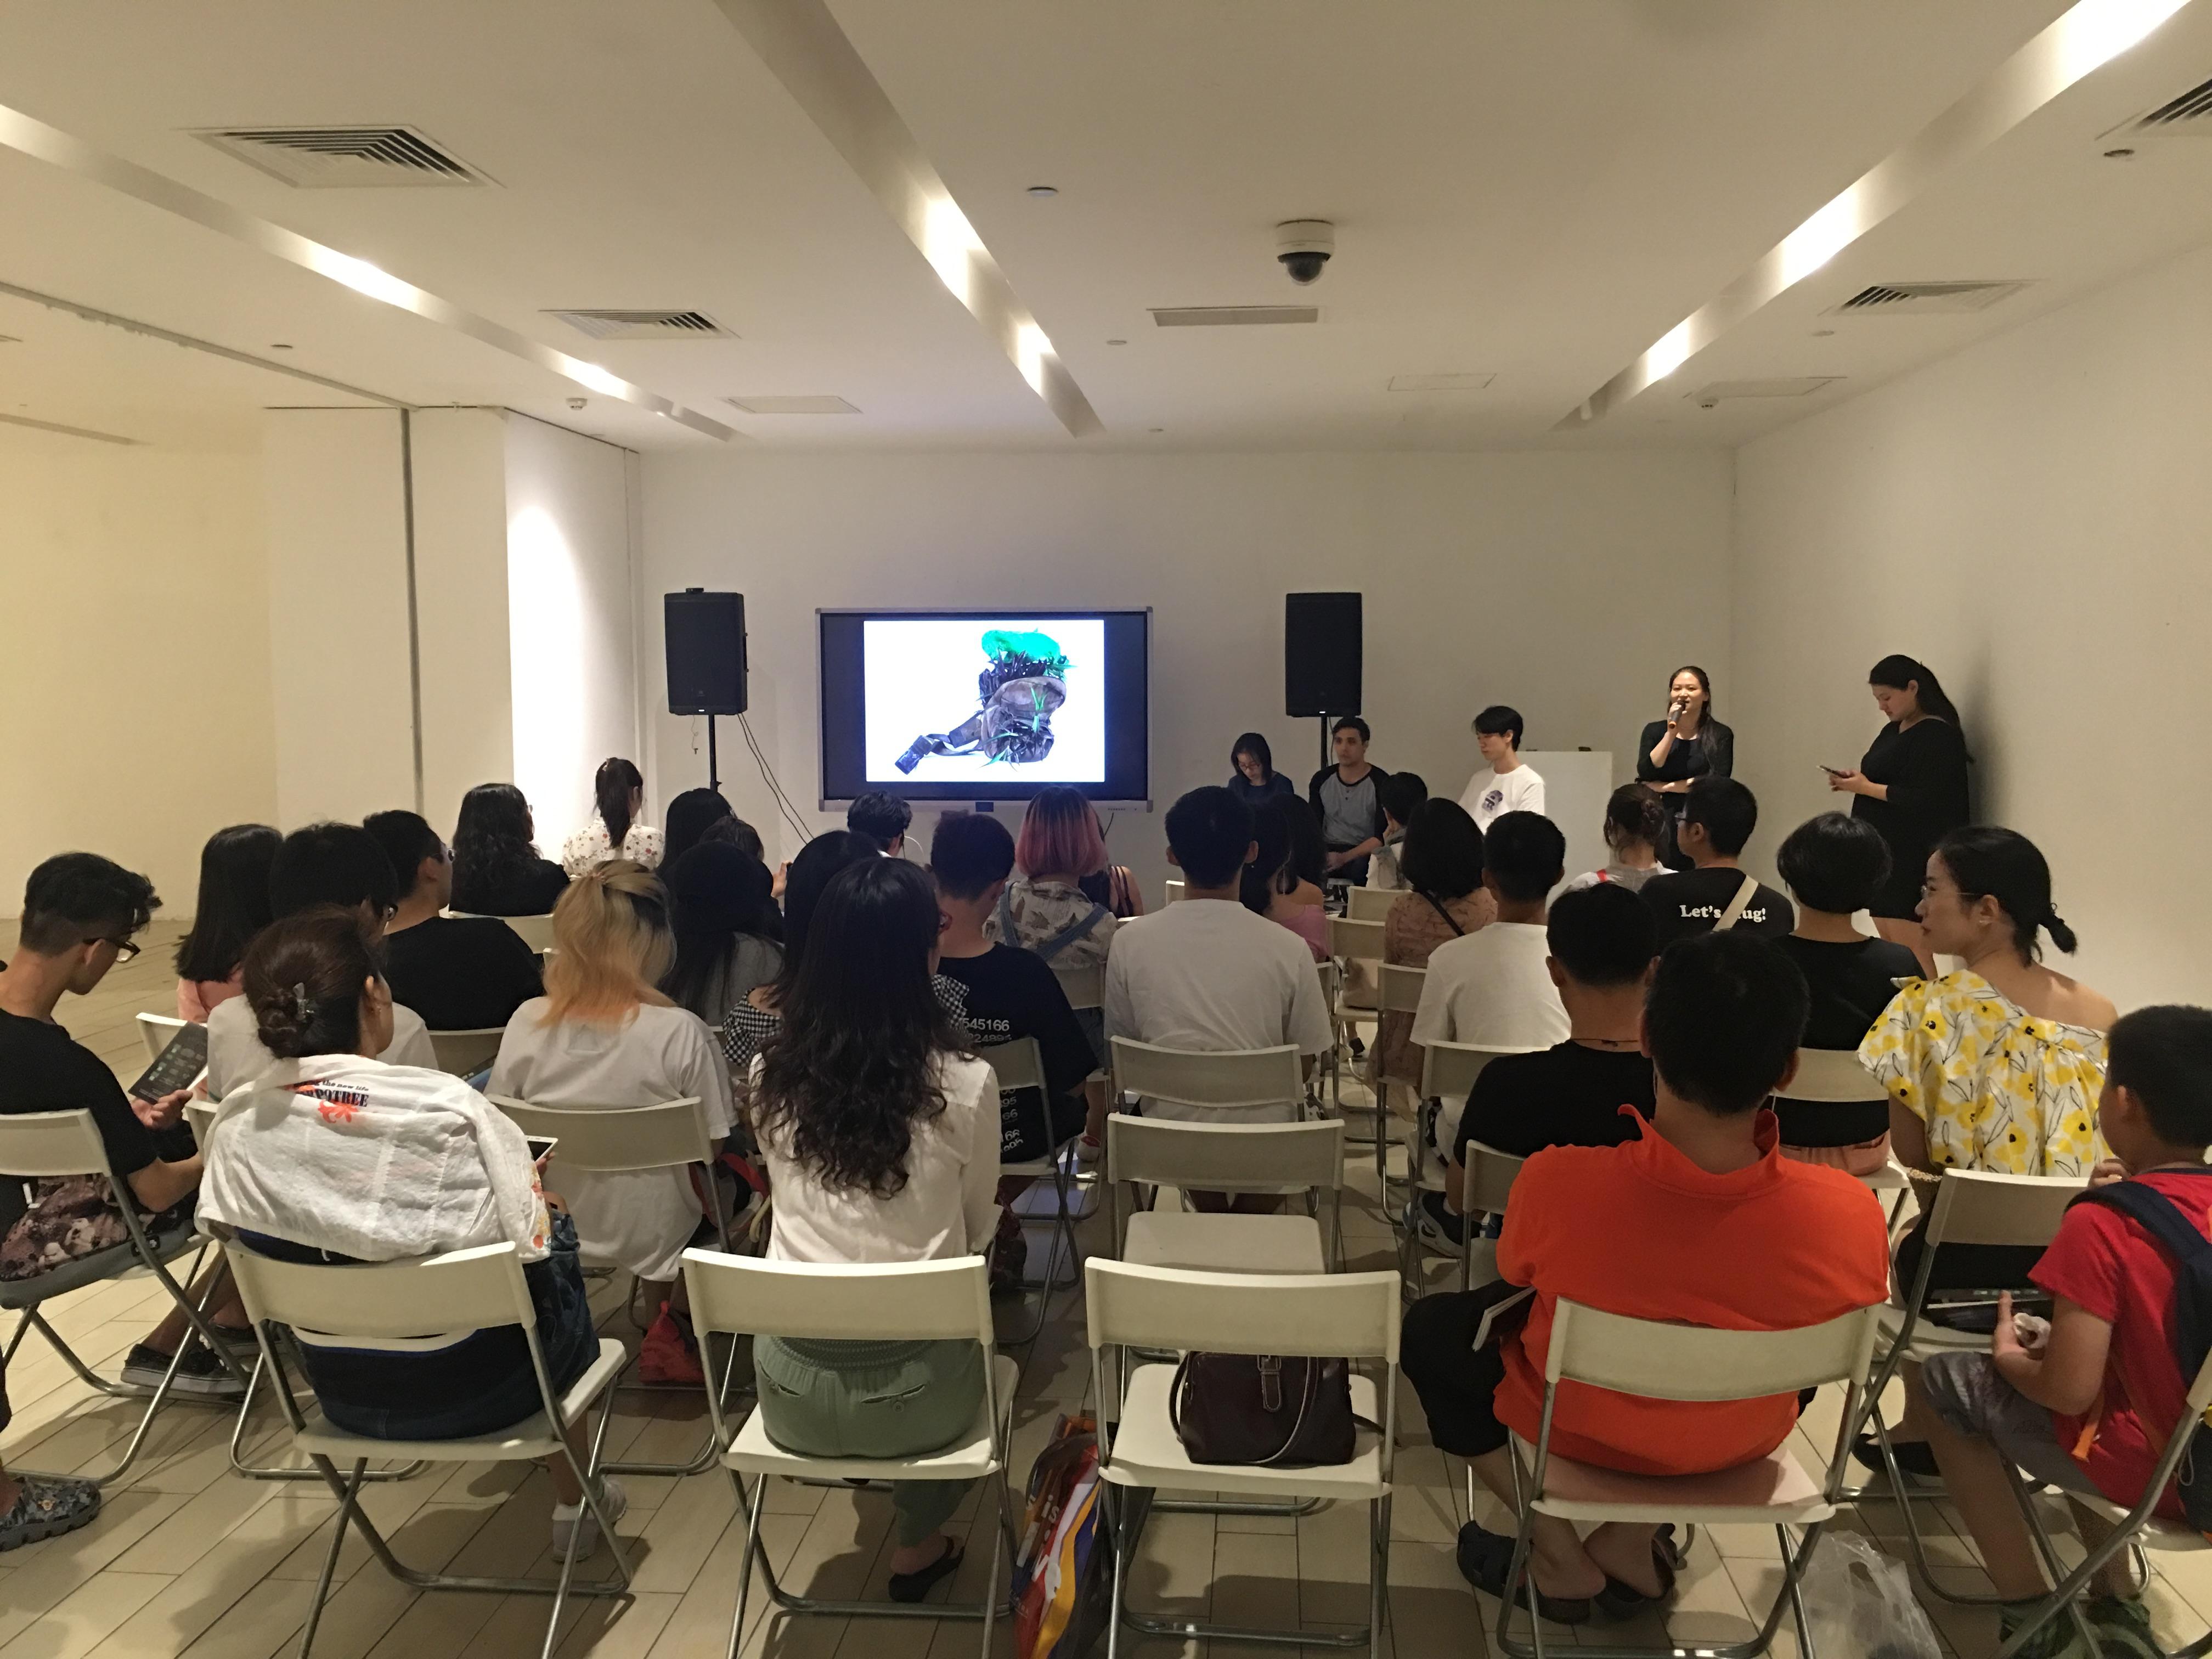 Andrew Luk gave a public art talk at chi K11 art museum